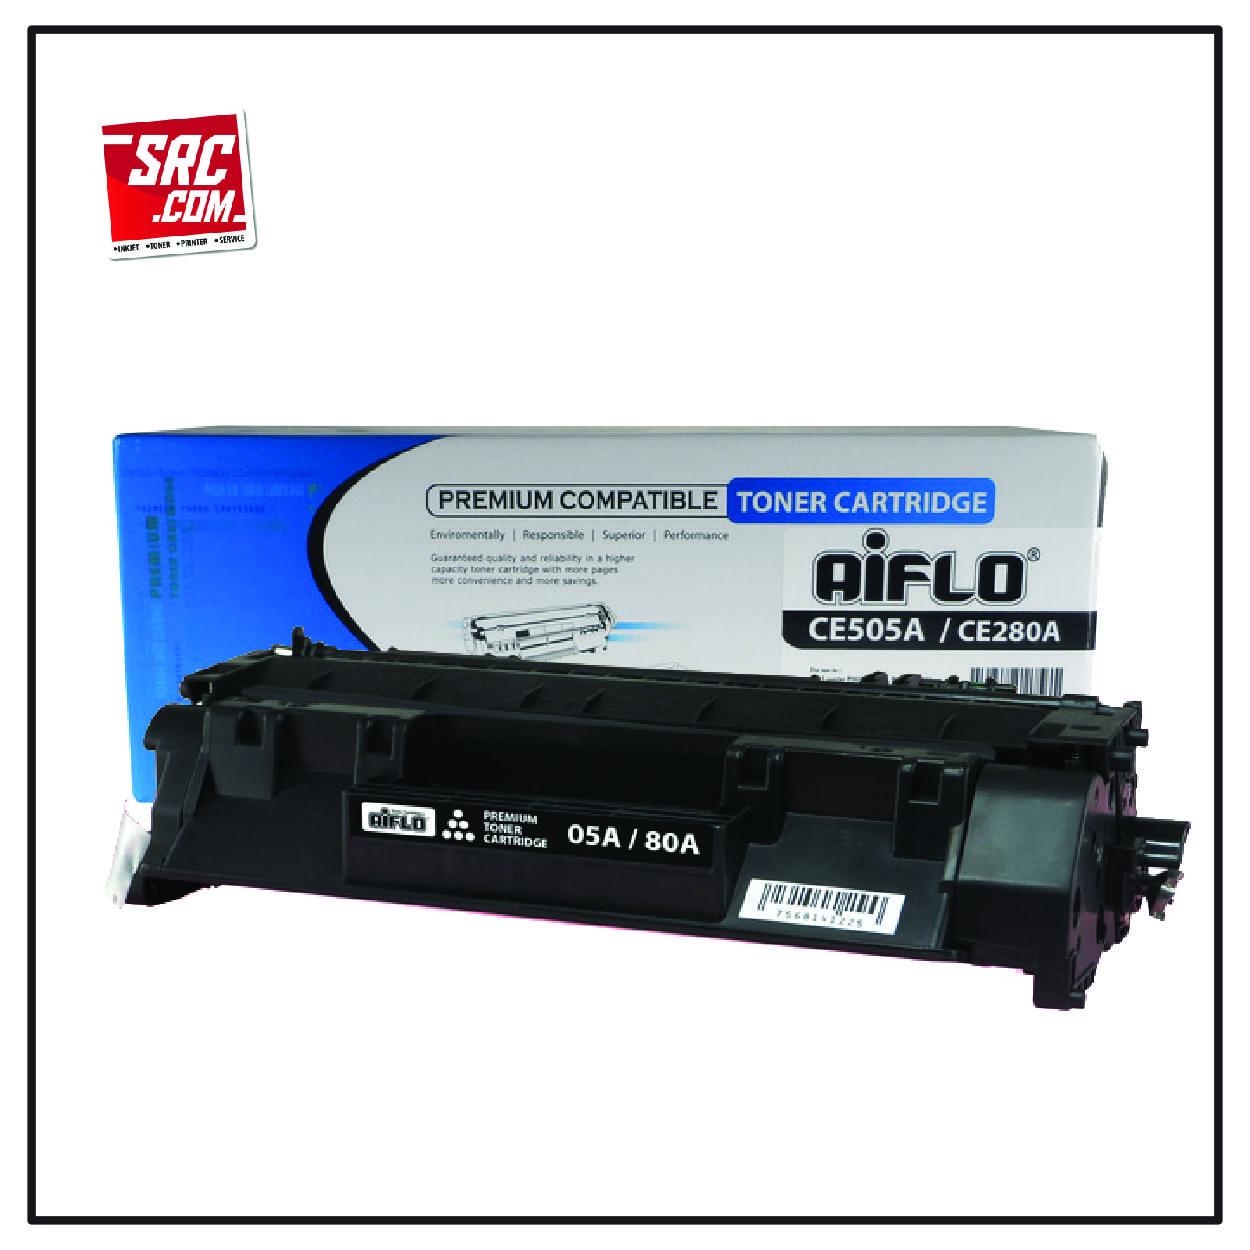 Aiflo Toner Hp 05a/80a Ce505a Ce280a Black Compatible Cartridge